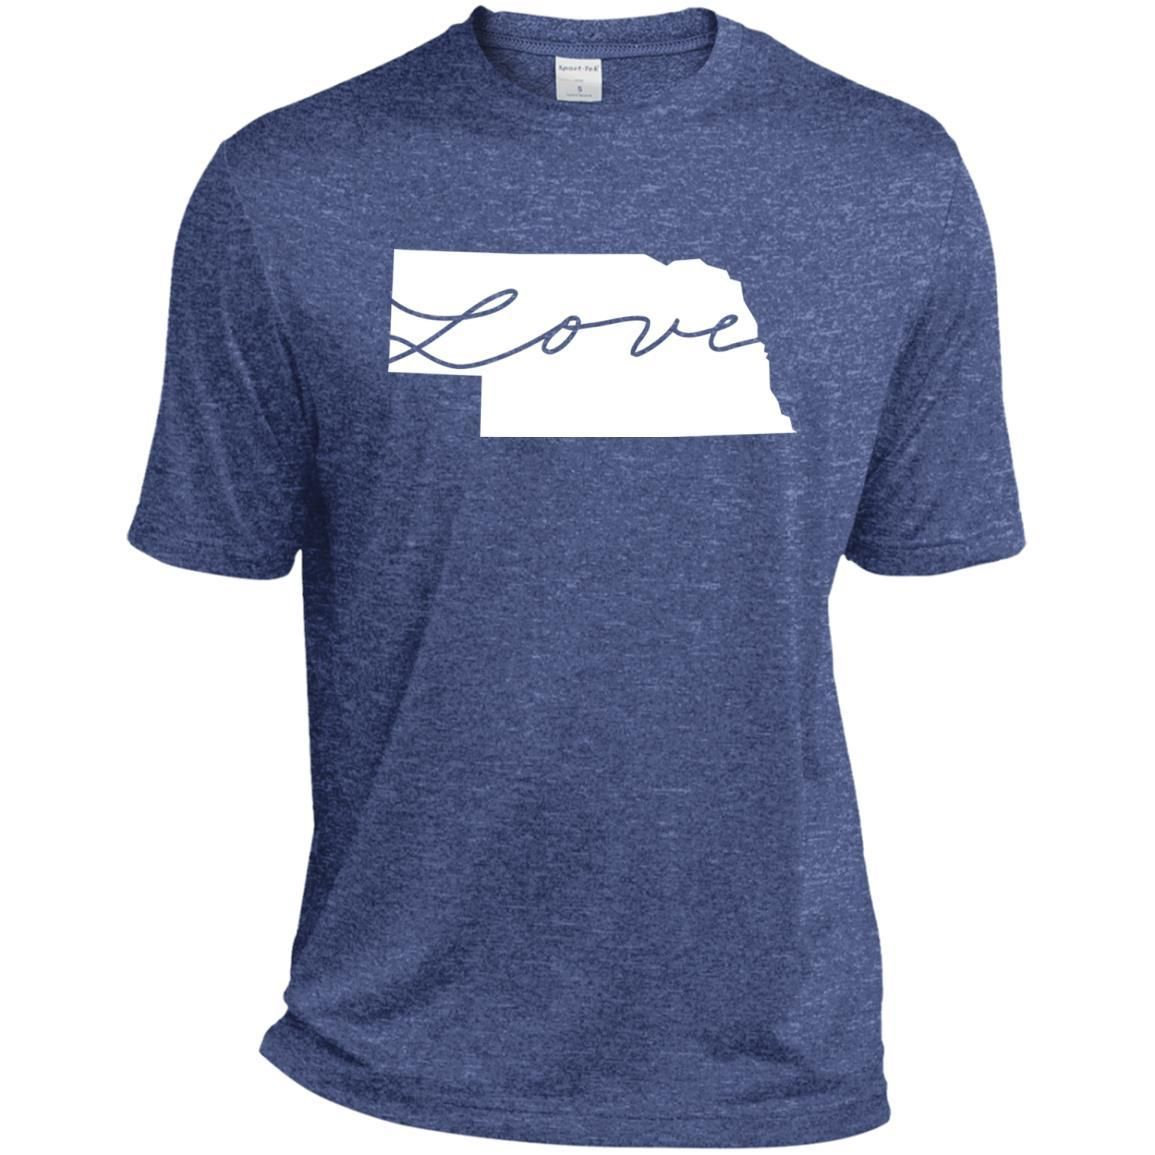 The State Love Collection - Nebraska T-shirt-01 ST360 Sport-Tek Heather Dri-Fit Moisture-Wicking T-Shirt